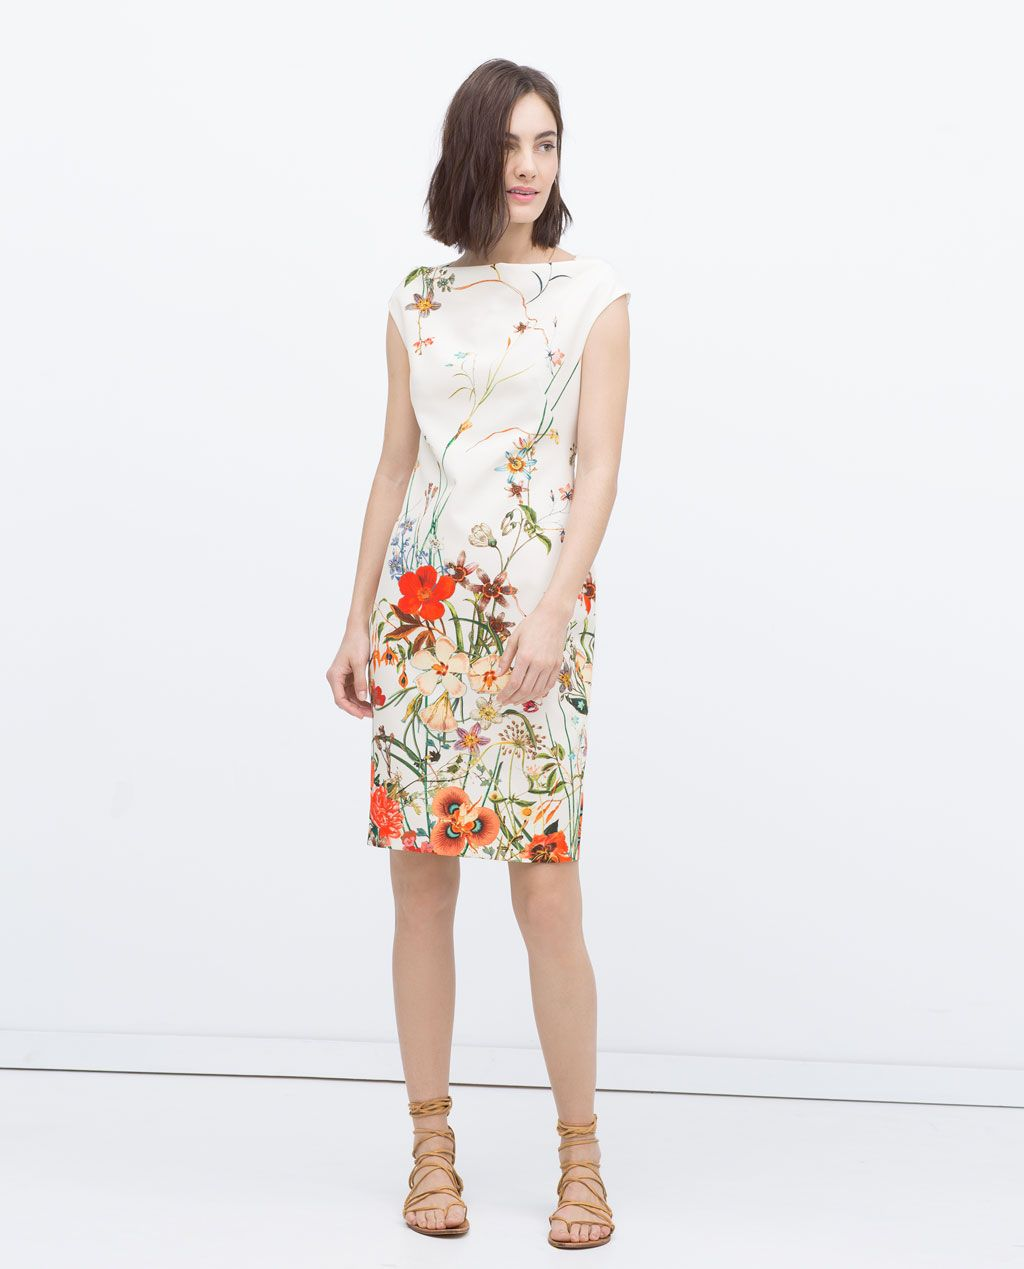 FLORAL PRINTED TUBE DRESS - Midi - Dresses - WOMAN  Zara floral